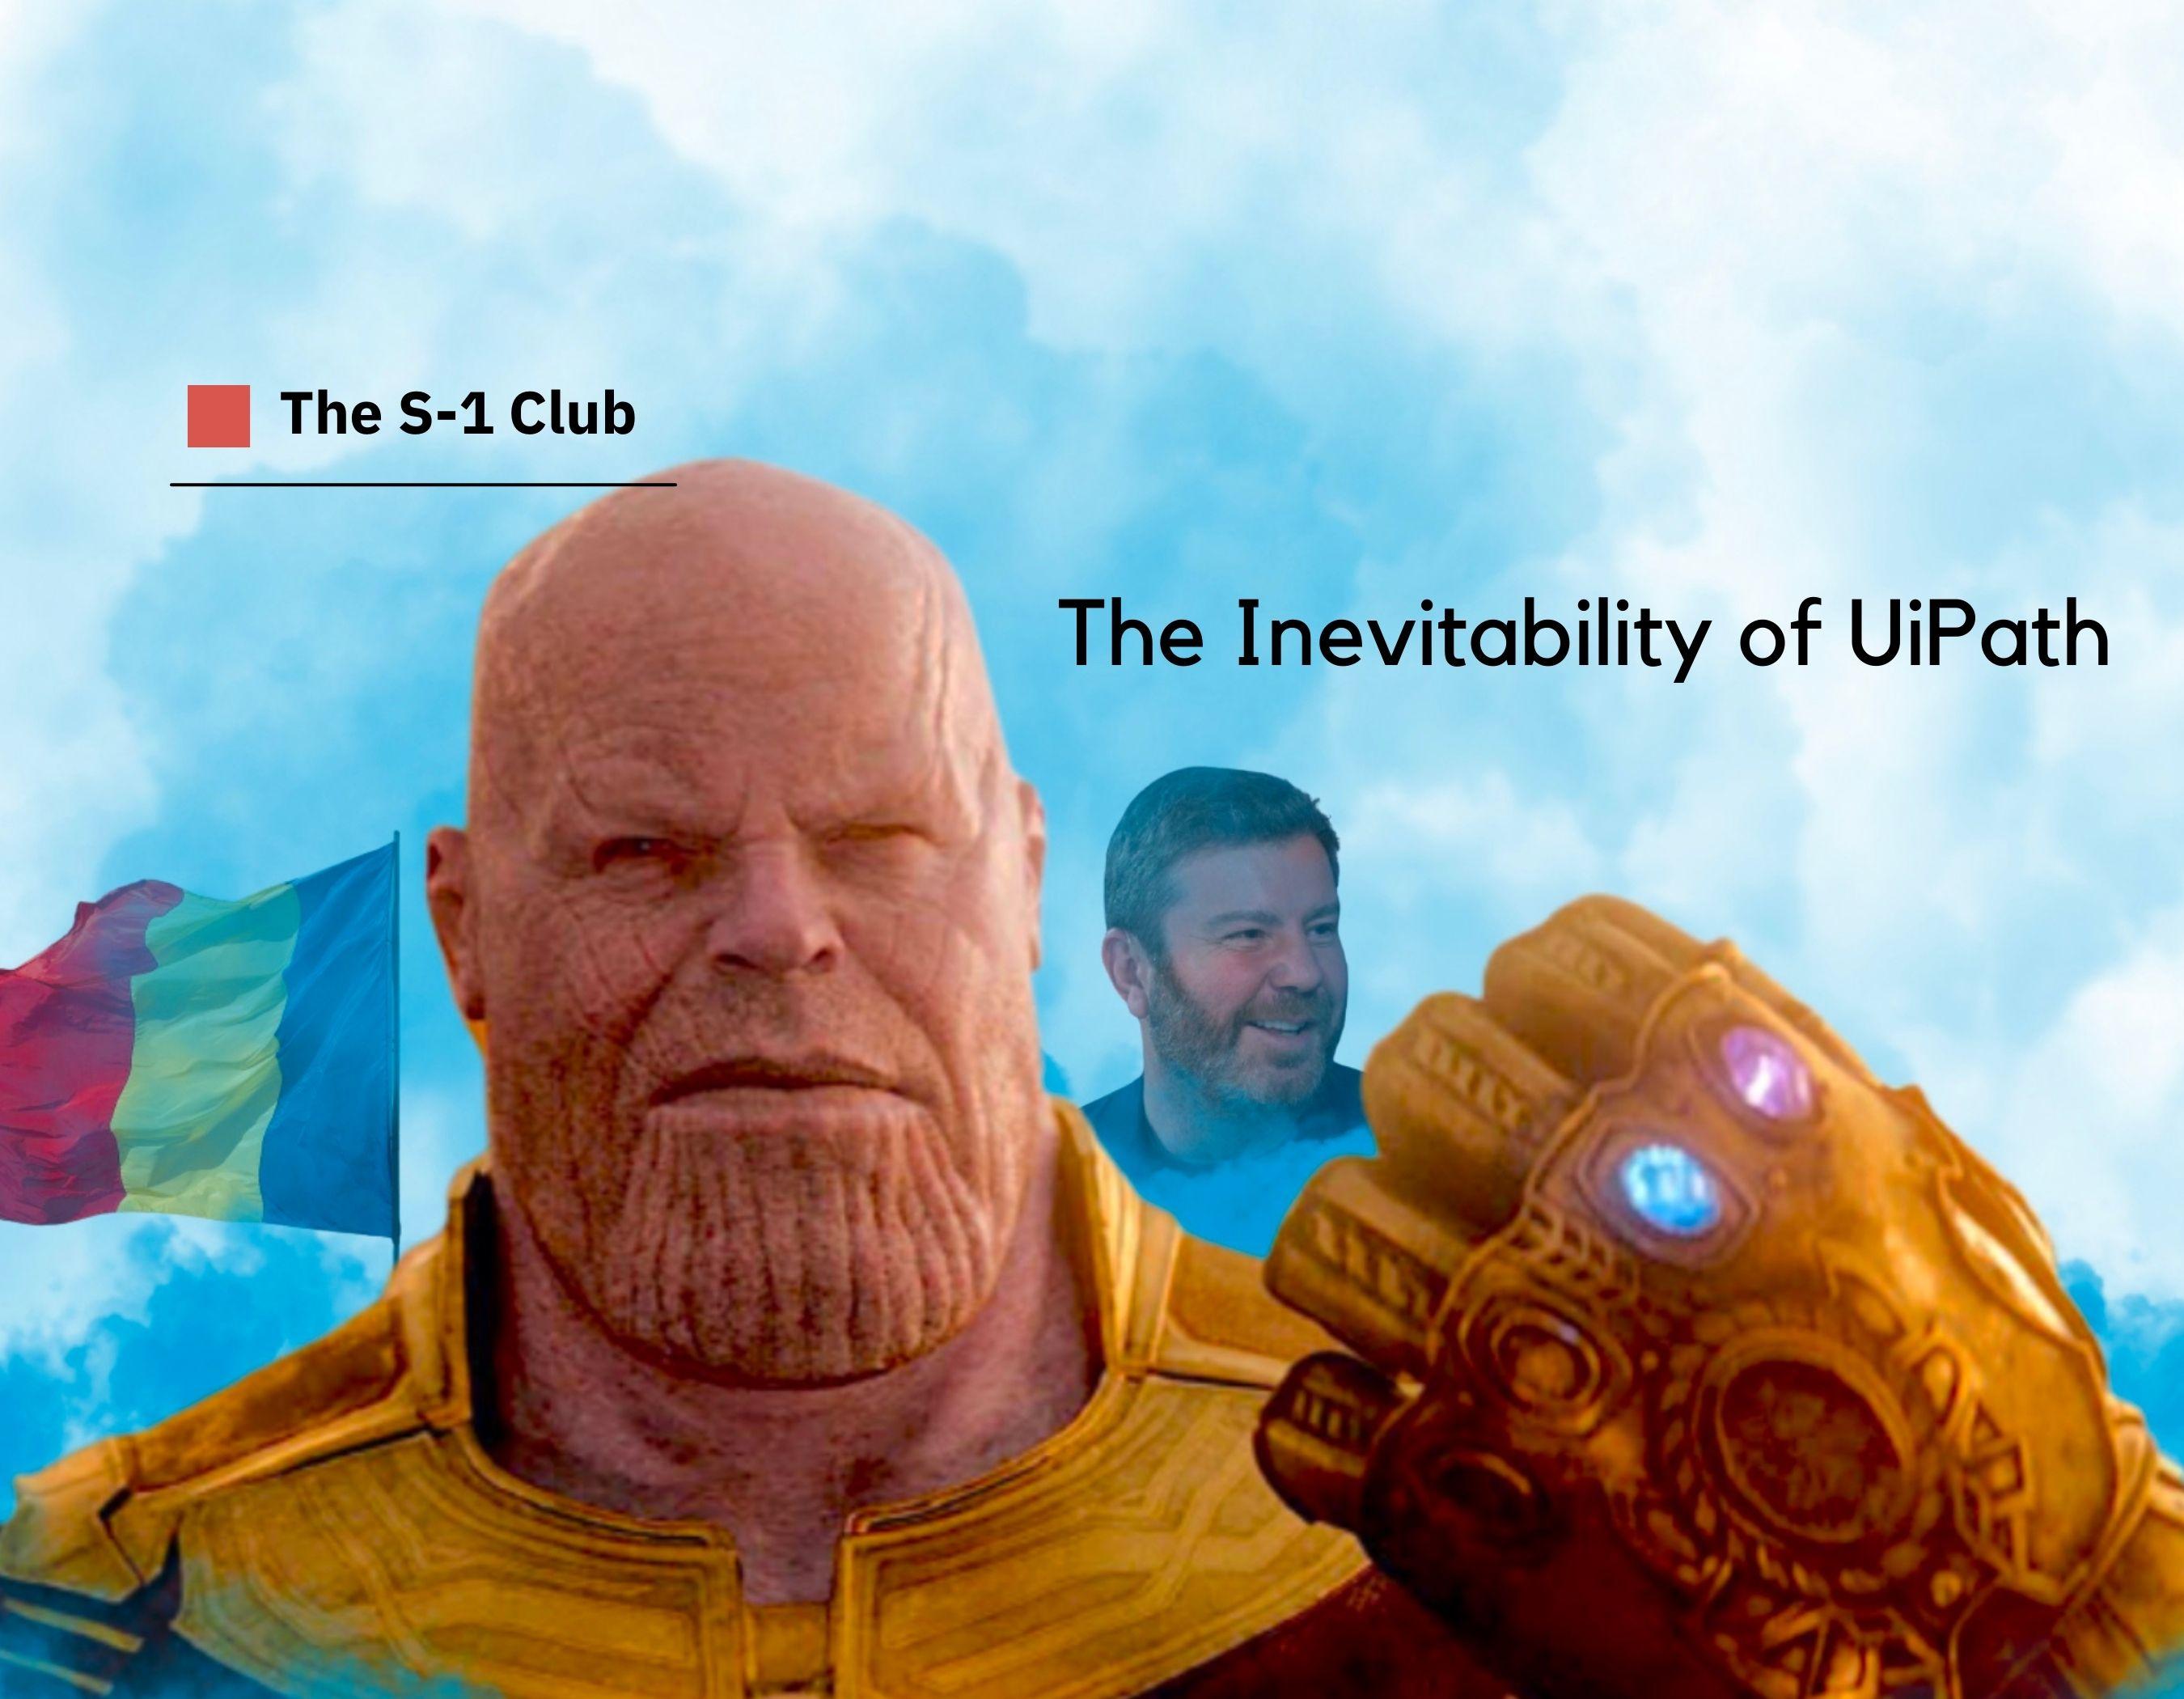 The Inevitability of UiPath